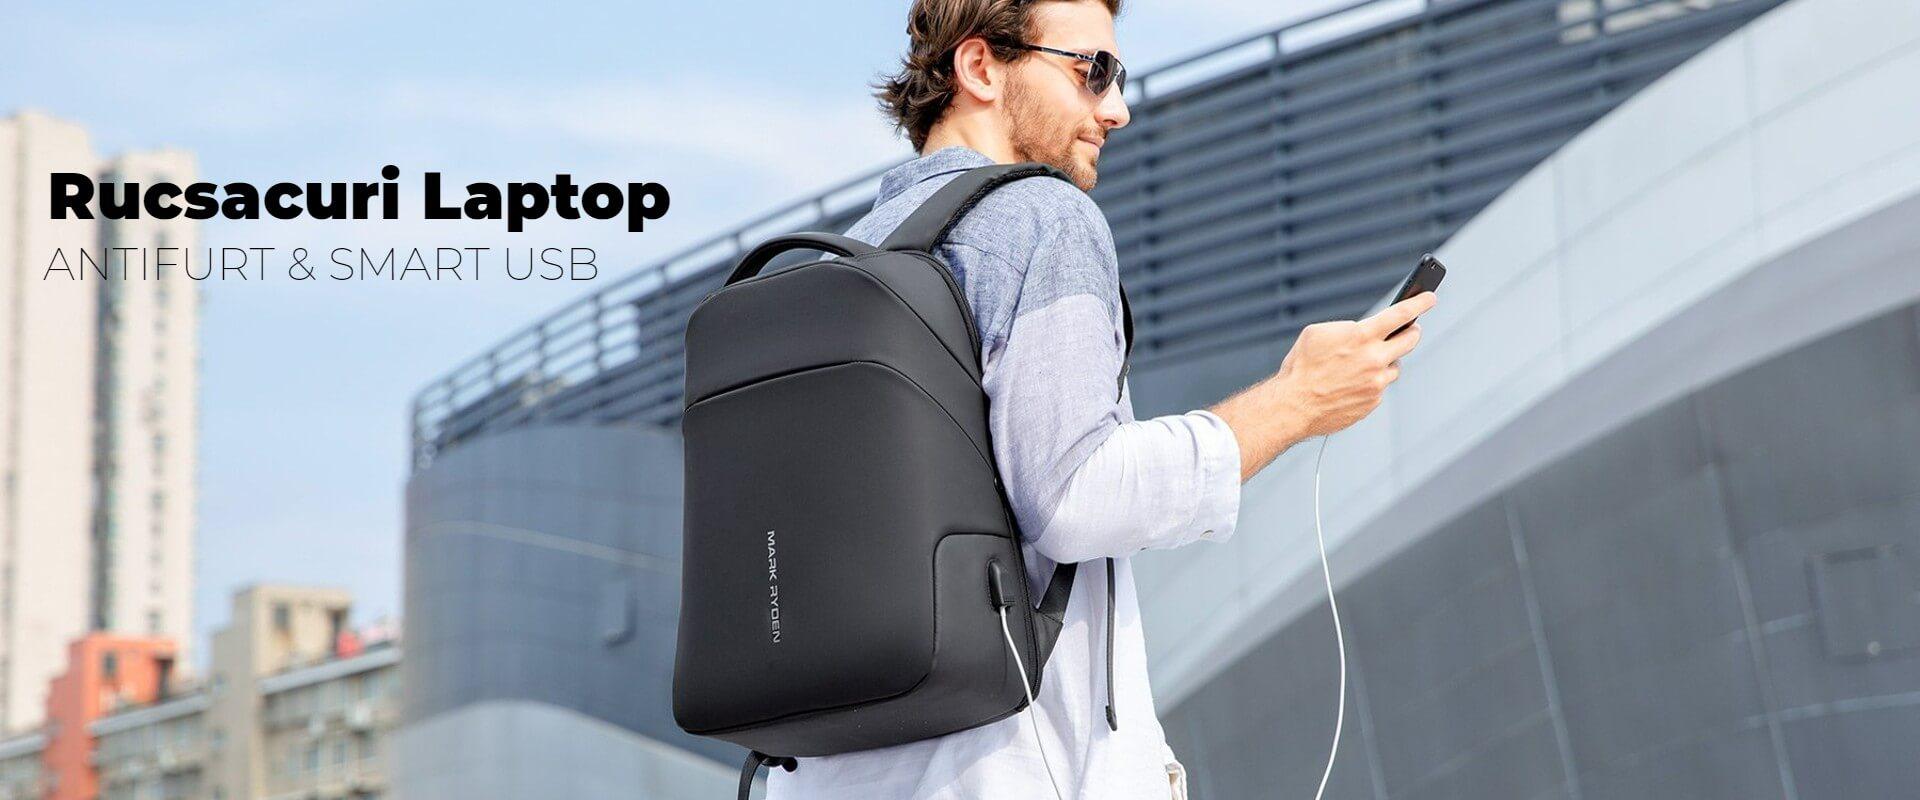 Rucsacuri-Laptop-Antifurt-Smart-USB